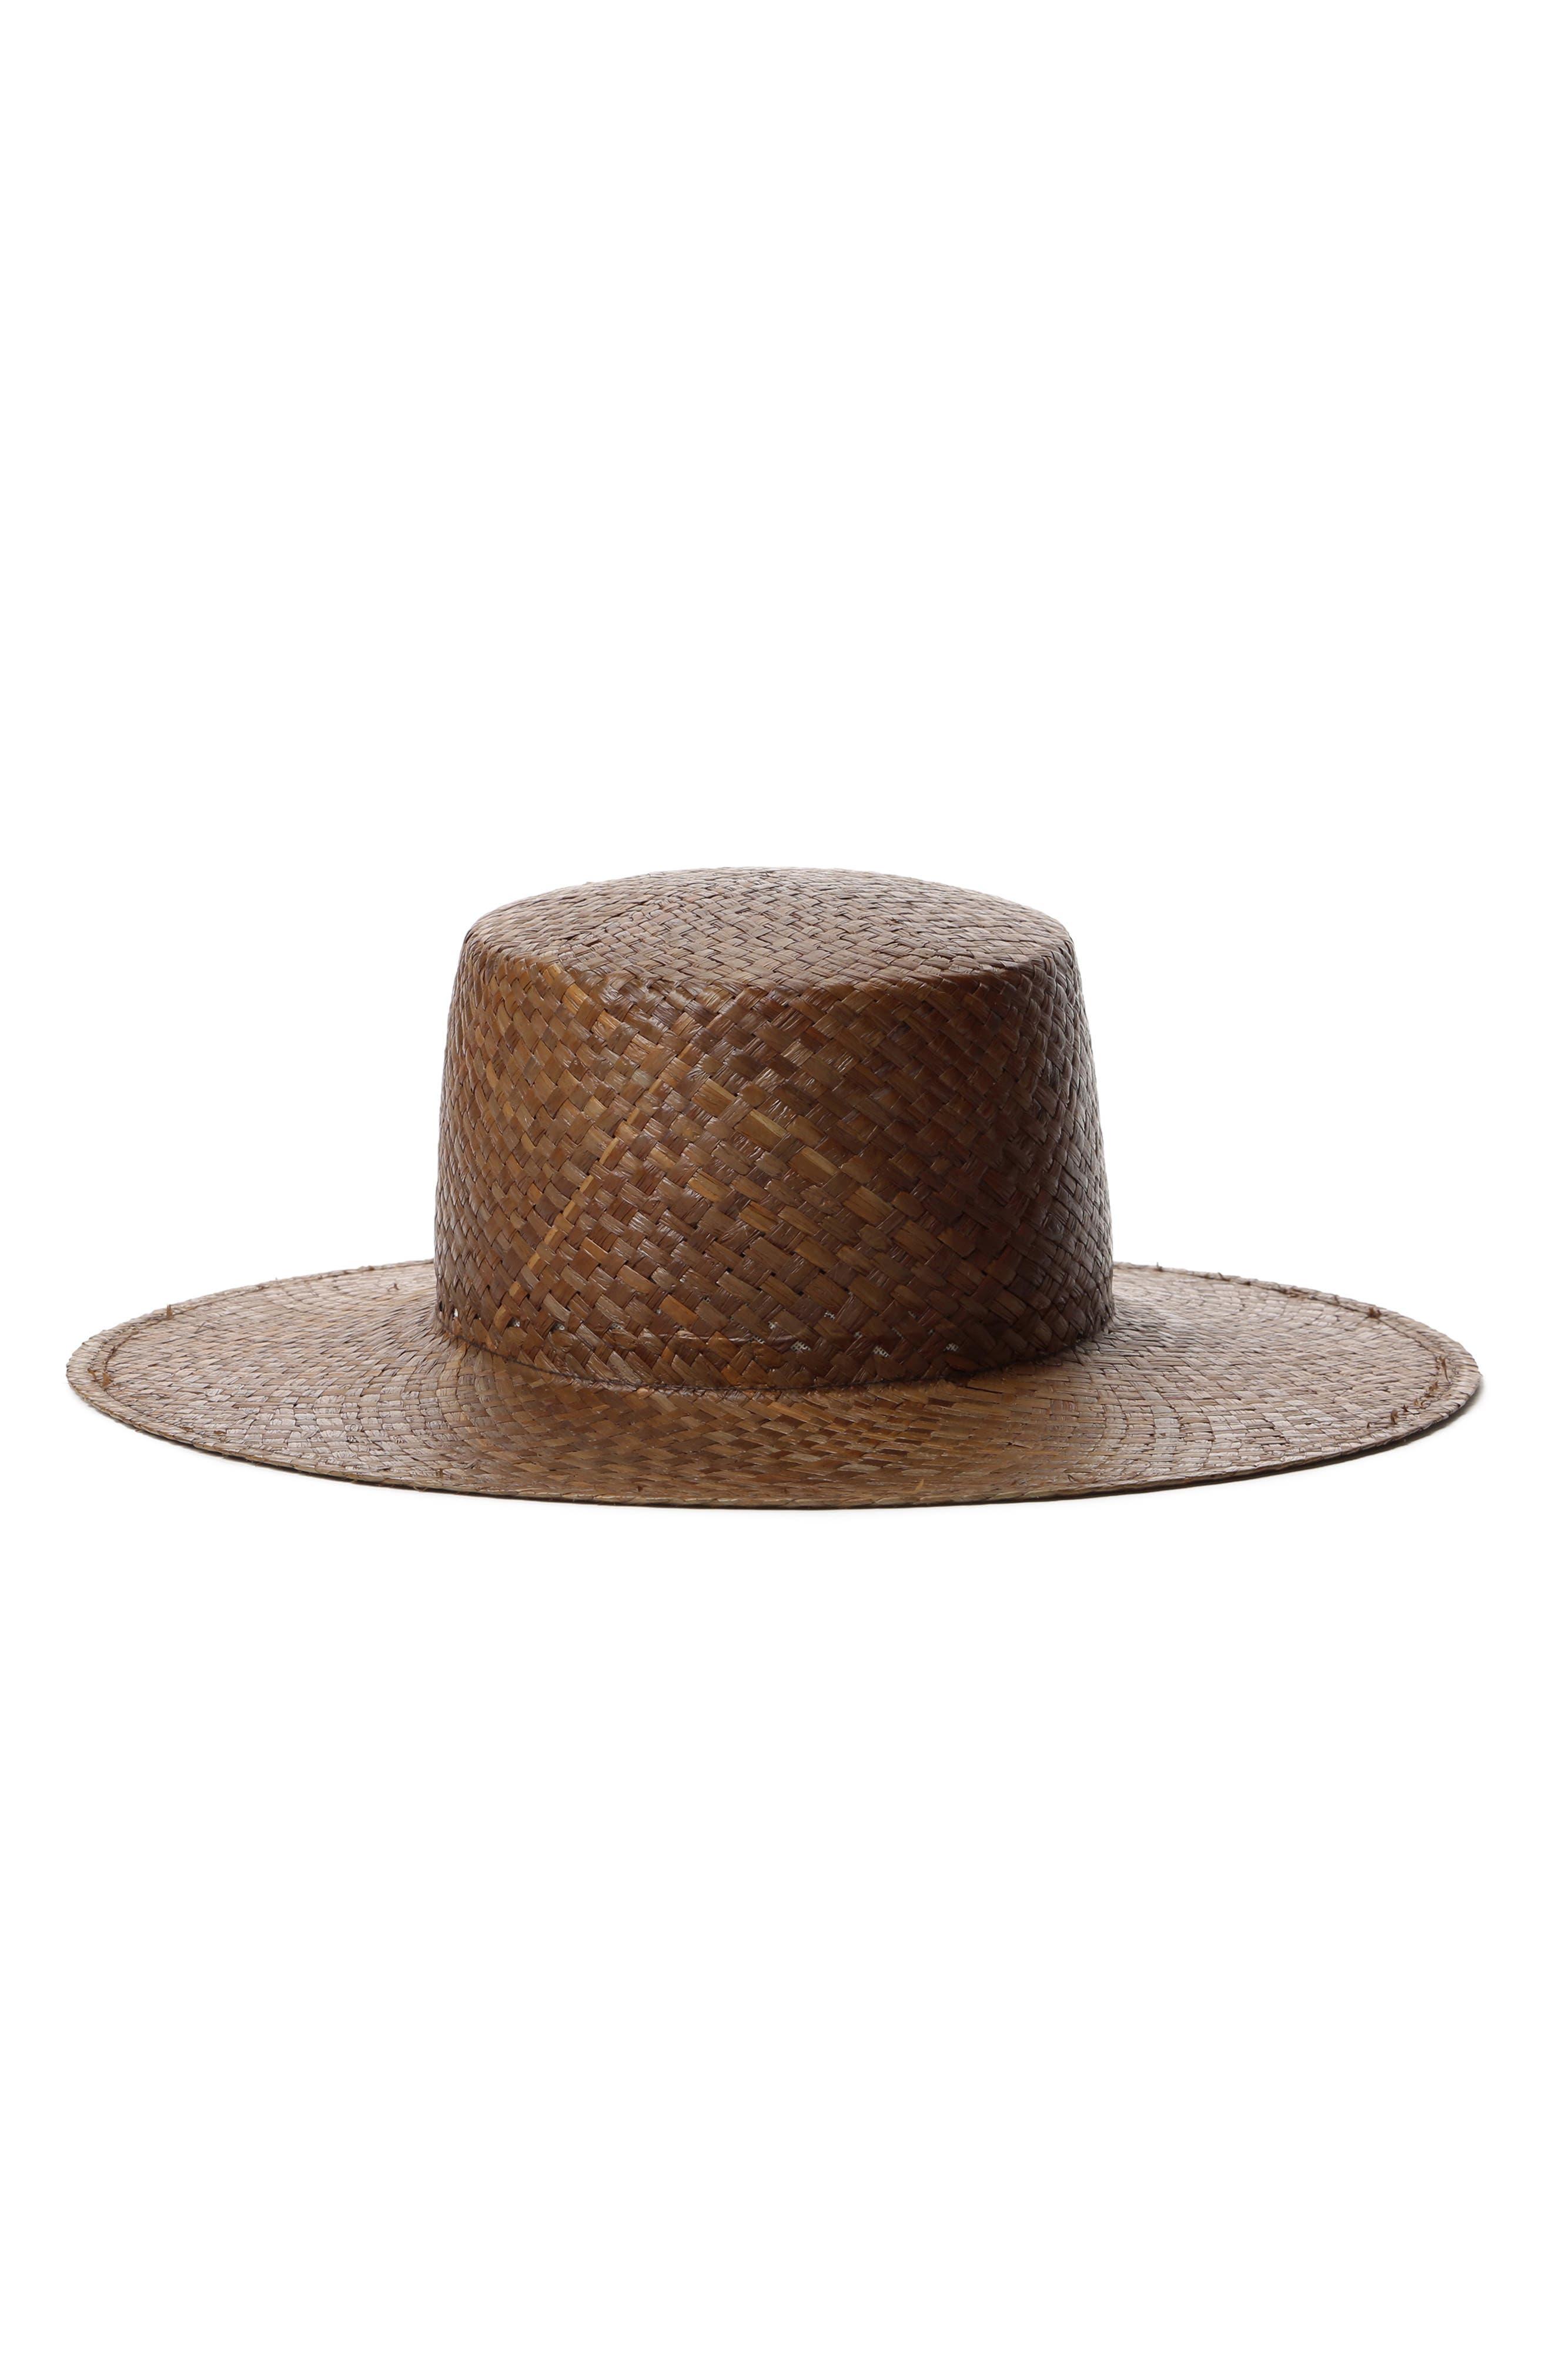 Gina Straw Boater Hat